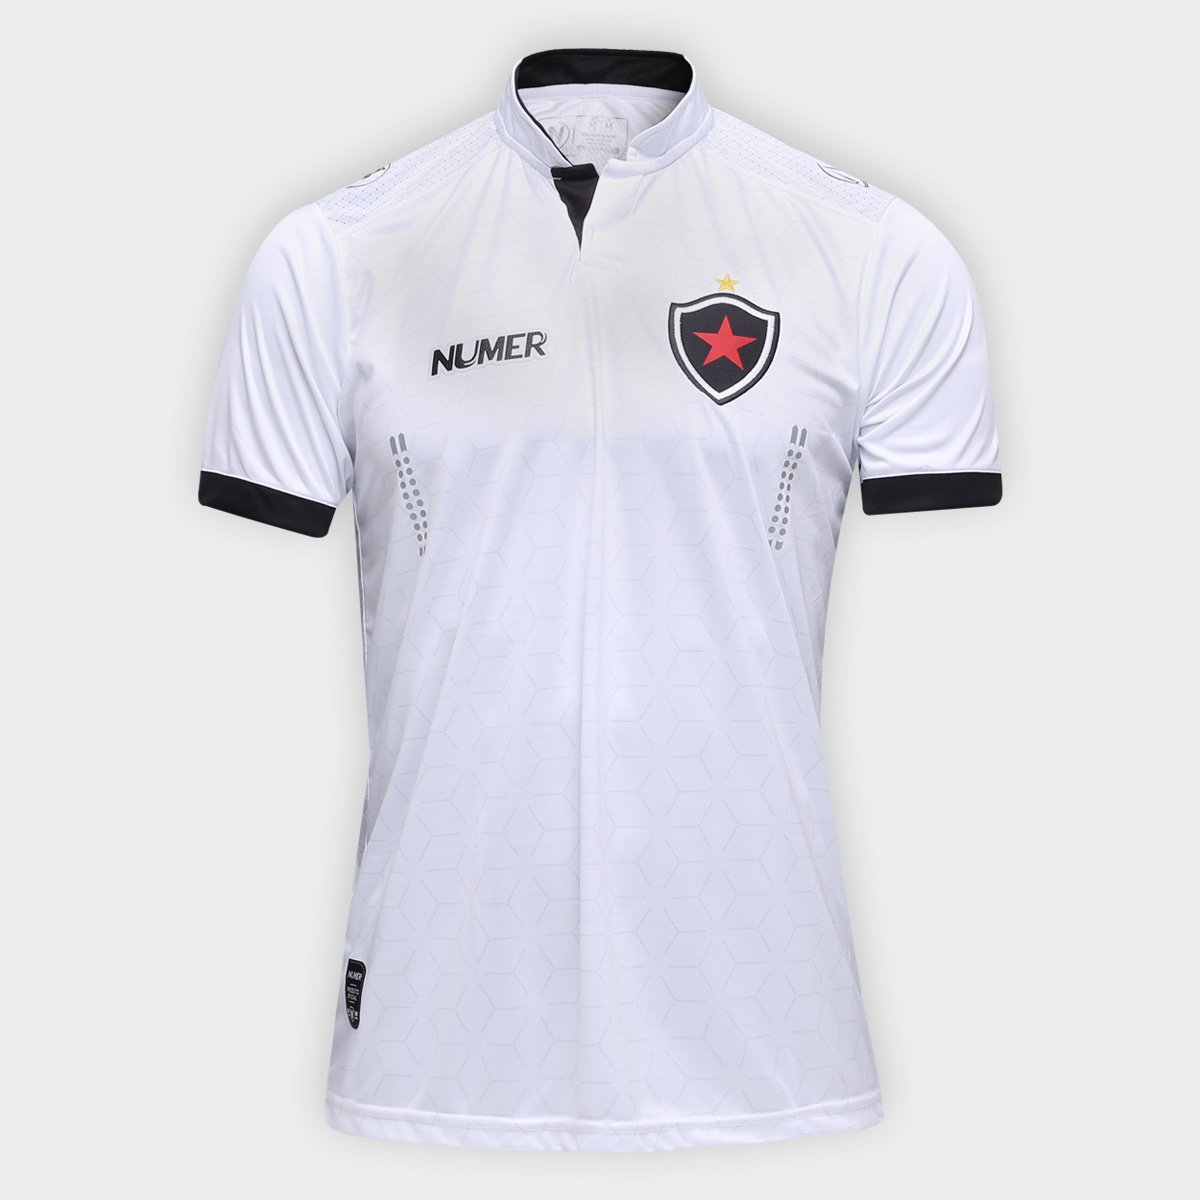 692676a0daf3a Camisa Botafogo PB II 17 18 s nº - Torcedor Rinat Masculina - Compre Agora